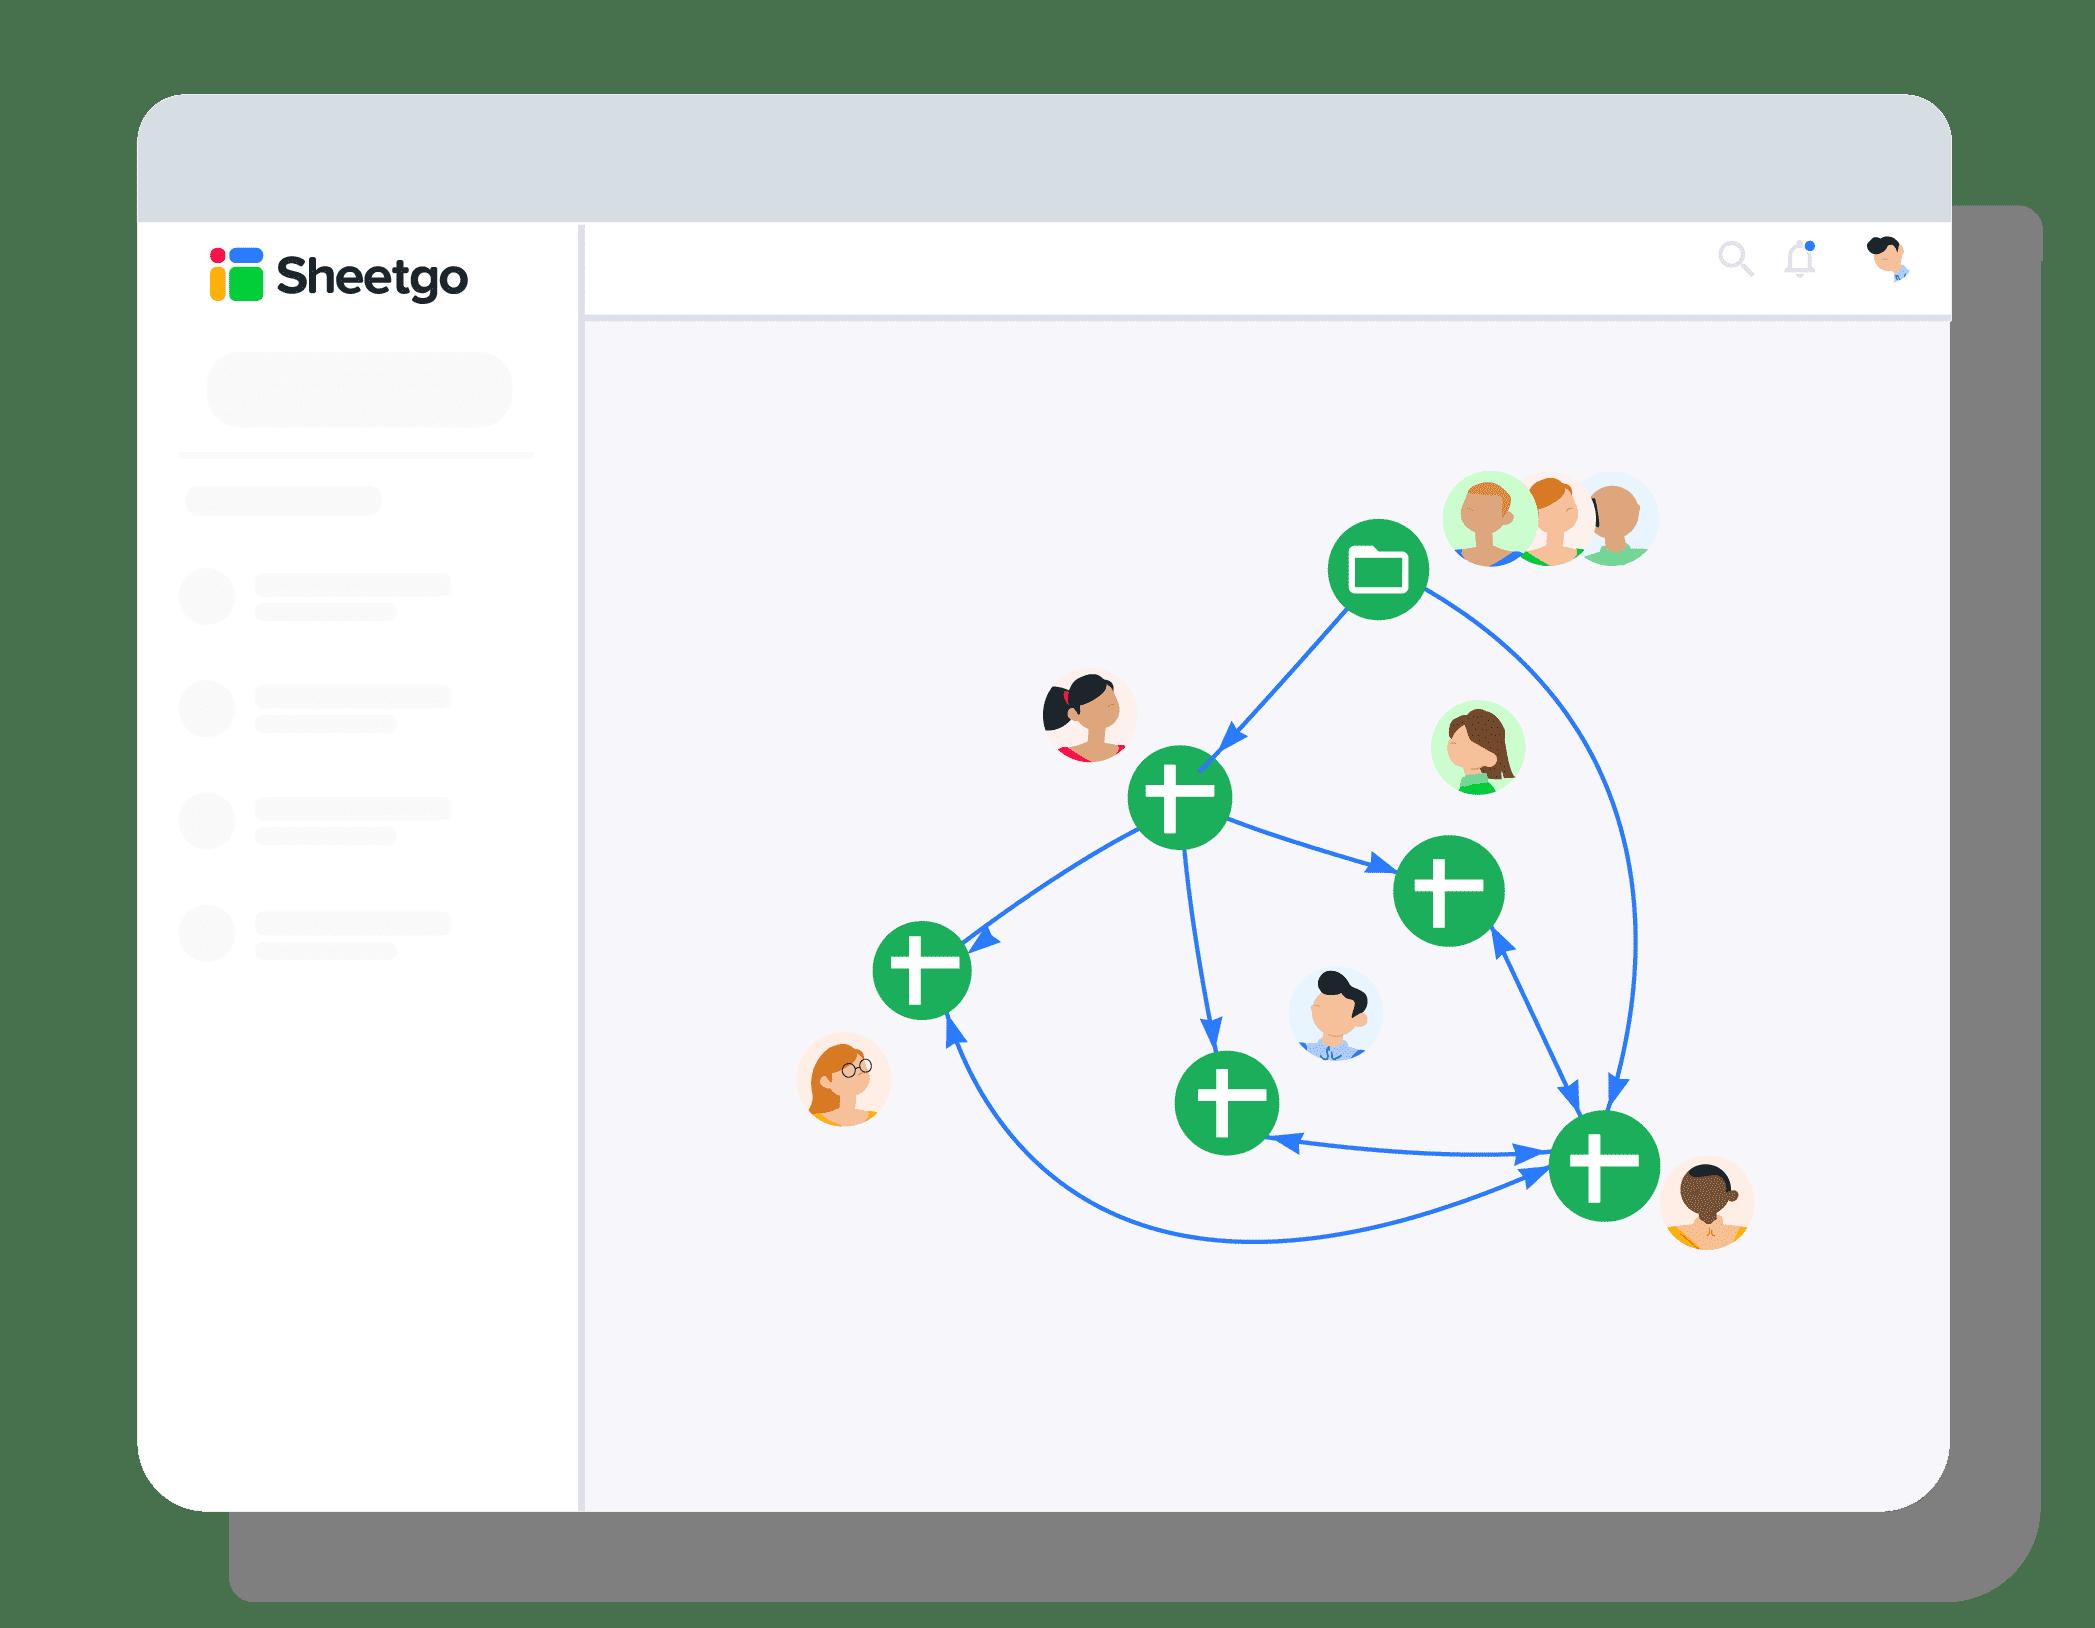 Workflow view Sheetgo - Importrange Google Sheets